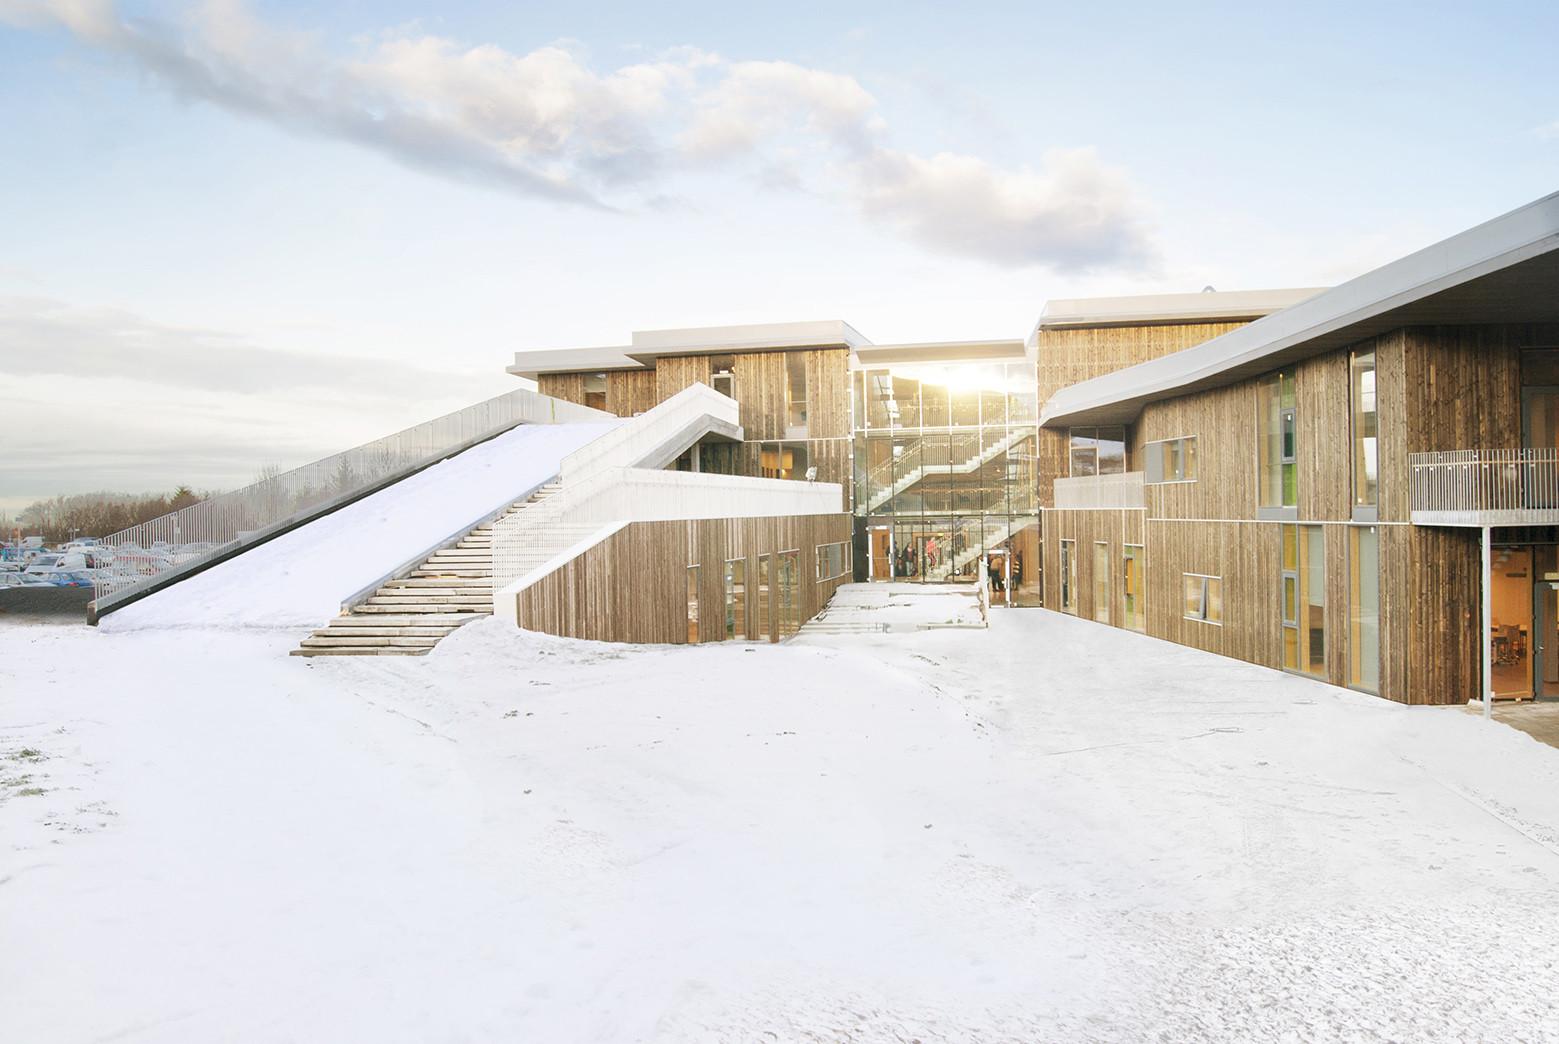 Mosfellsbær Preperatory High School / A2F arkitektar, Courtesy of A2F arkitektar